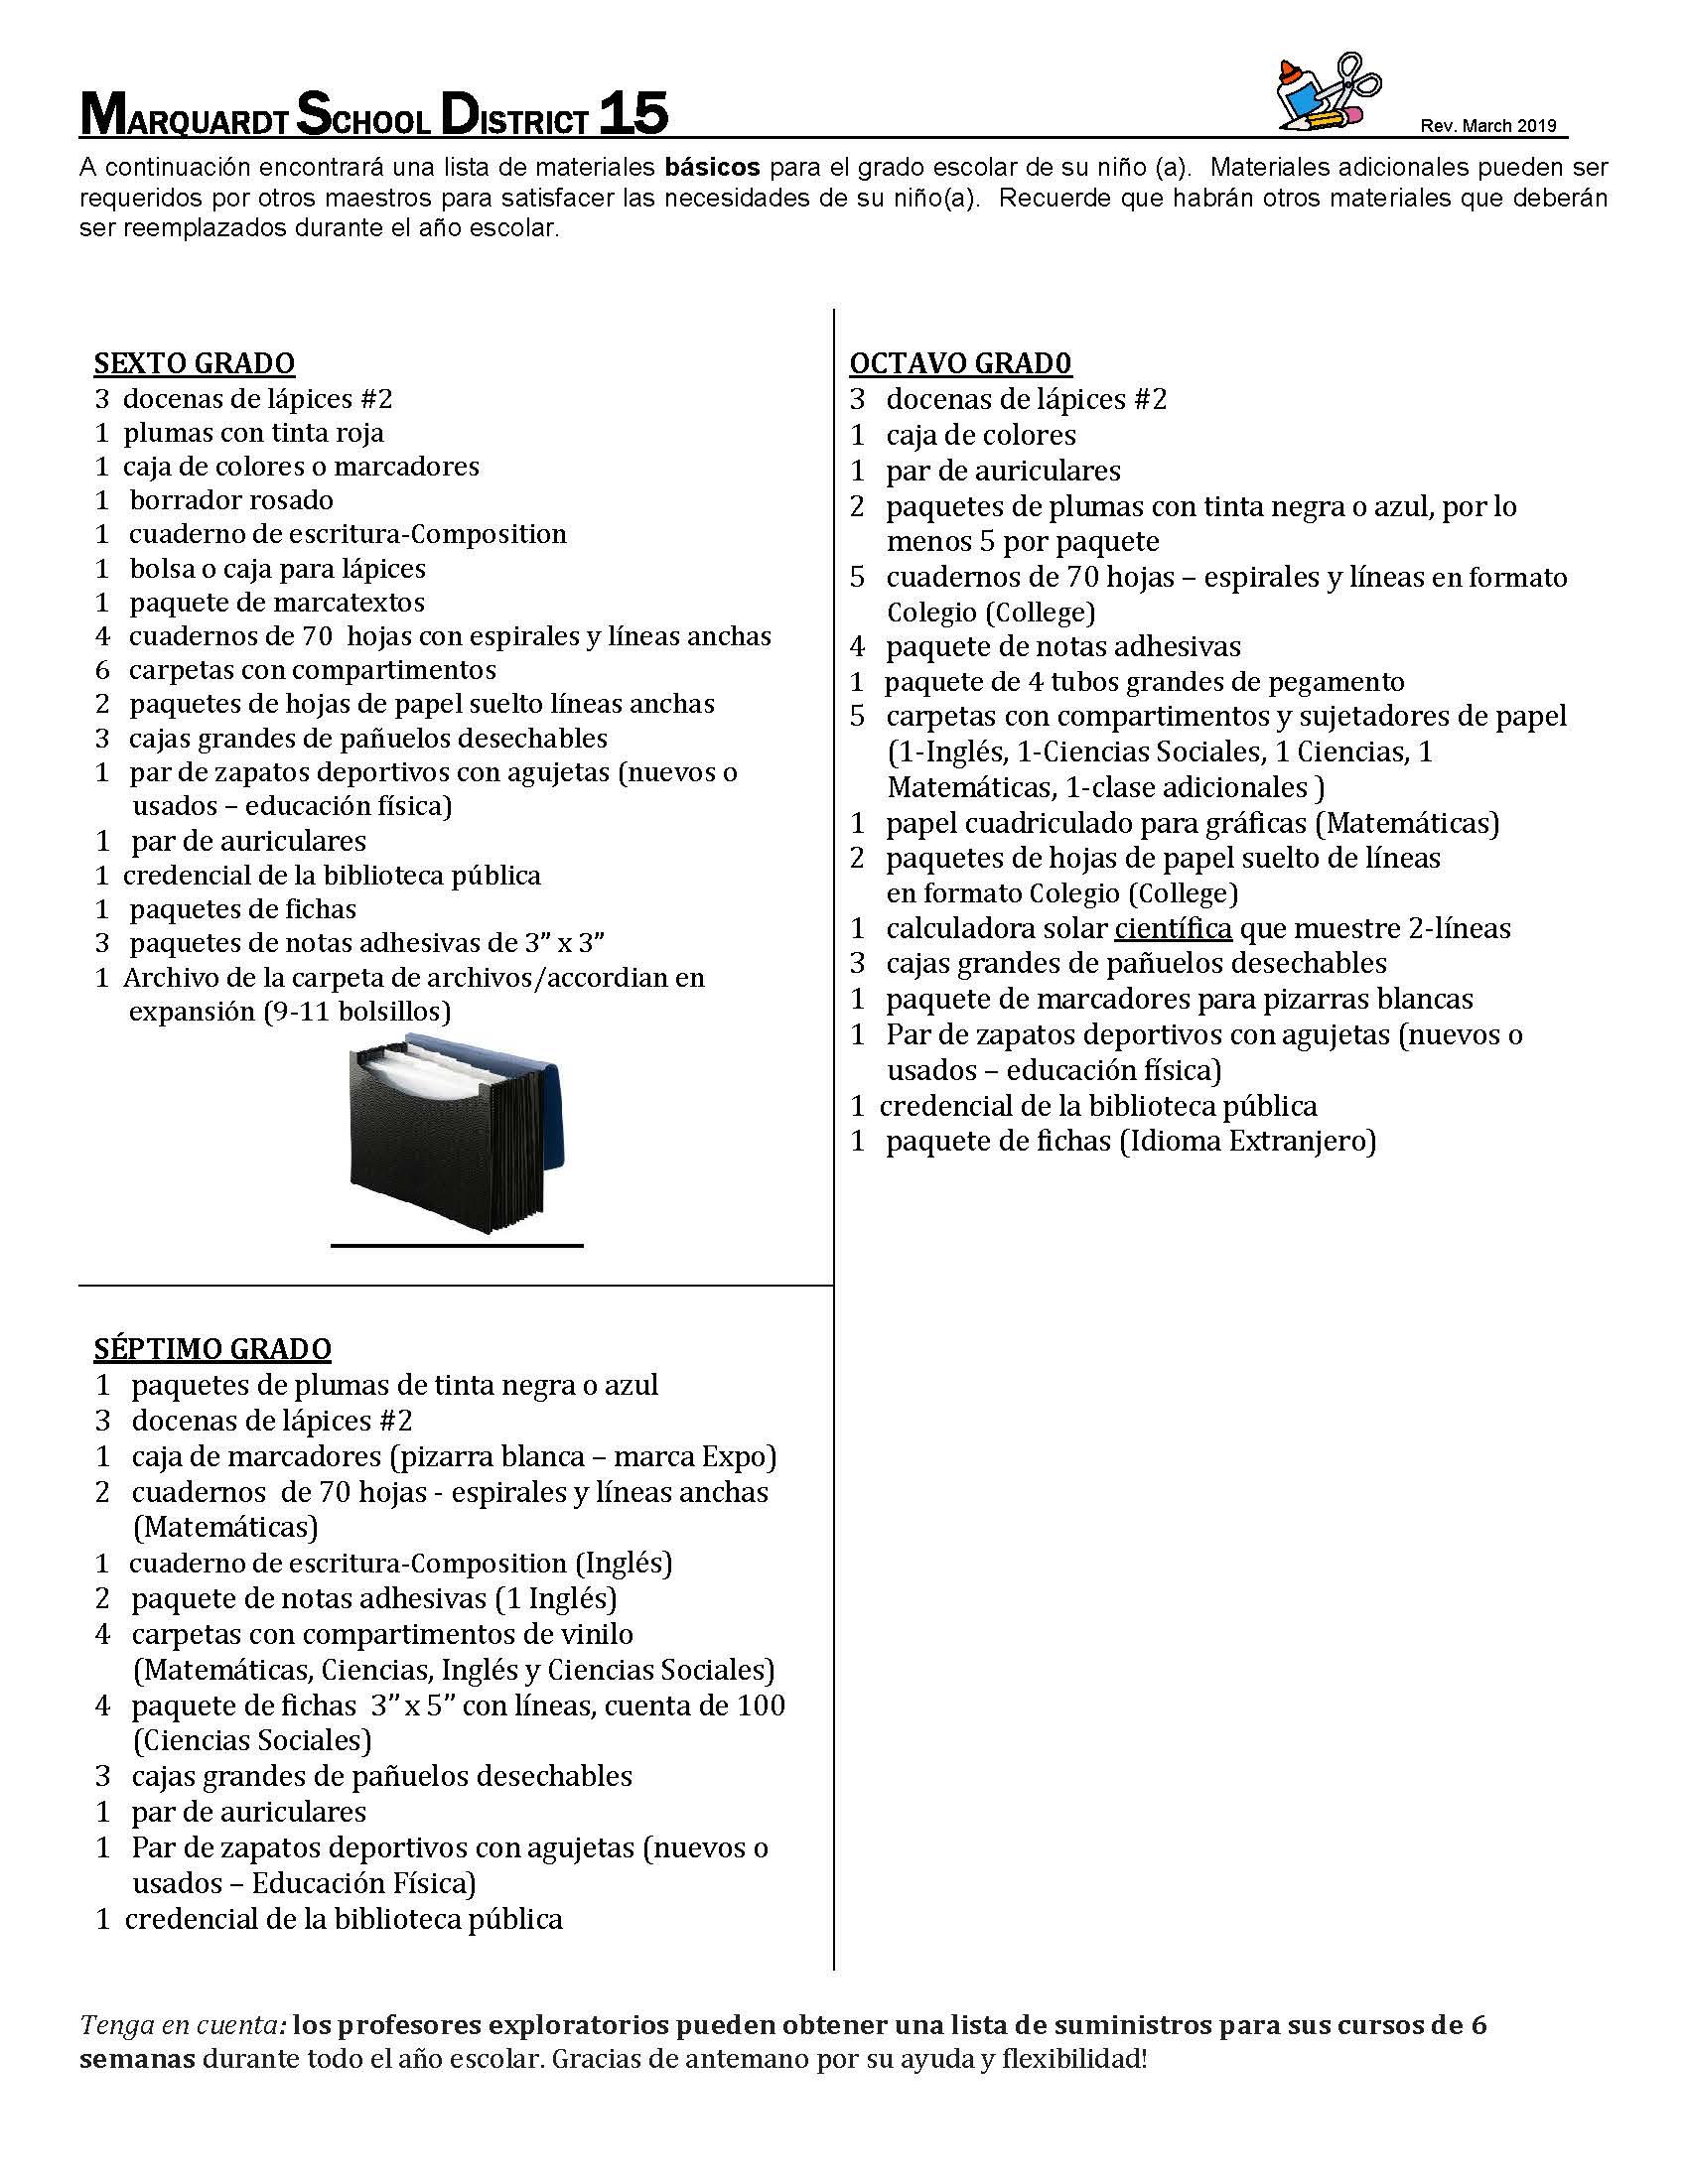 Supply+List+MMS+19-20+Spanish.jpg